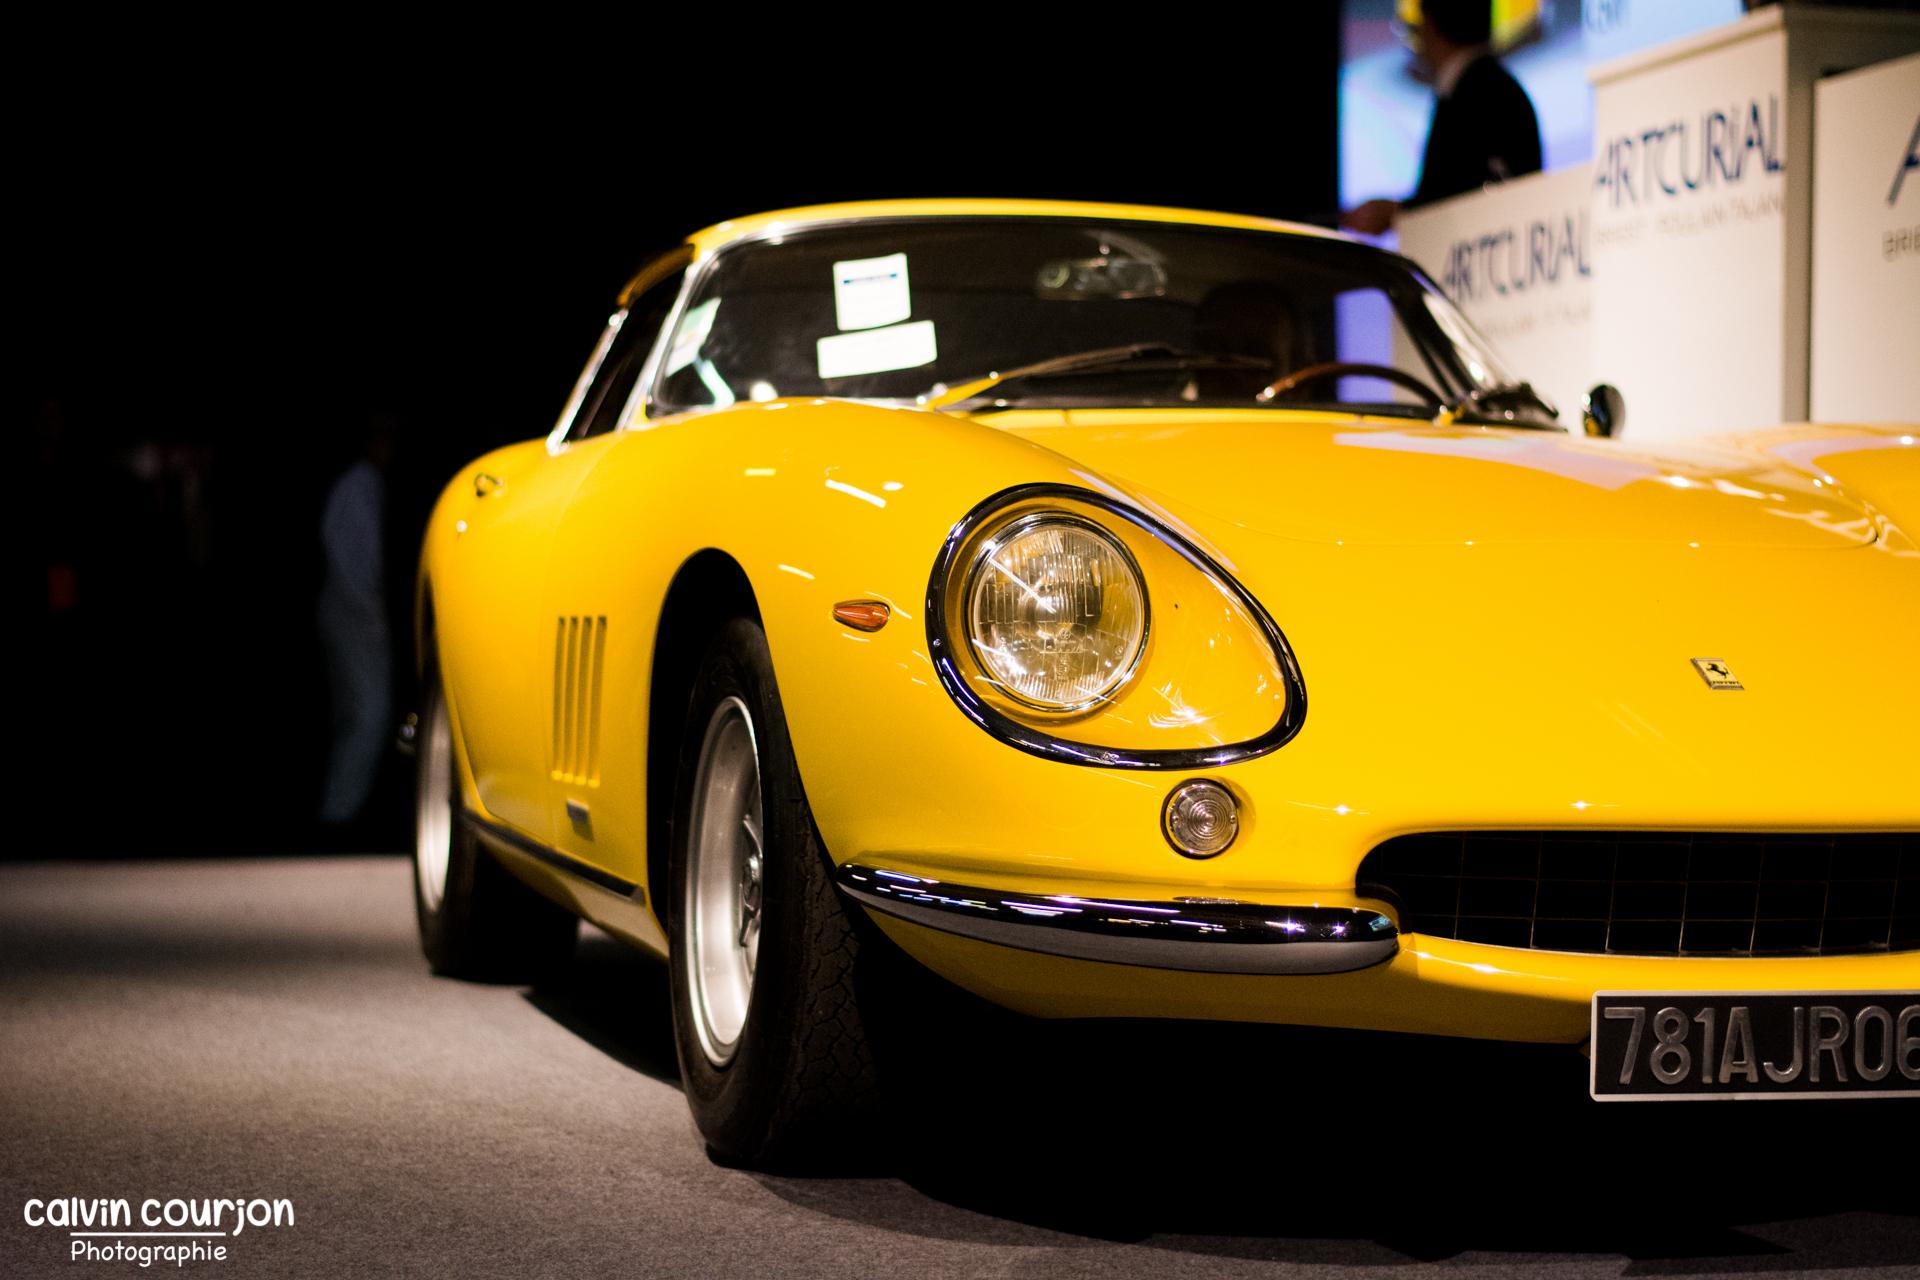 1966 Ferrari 275 GTB 2 - Calvin Courjon Photographie